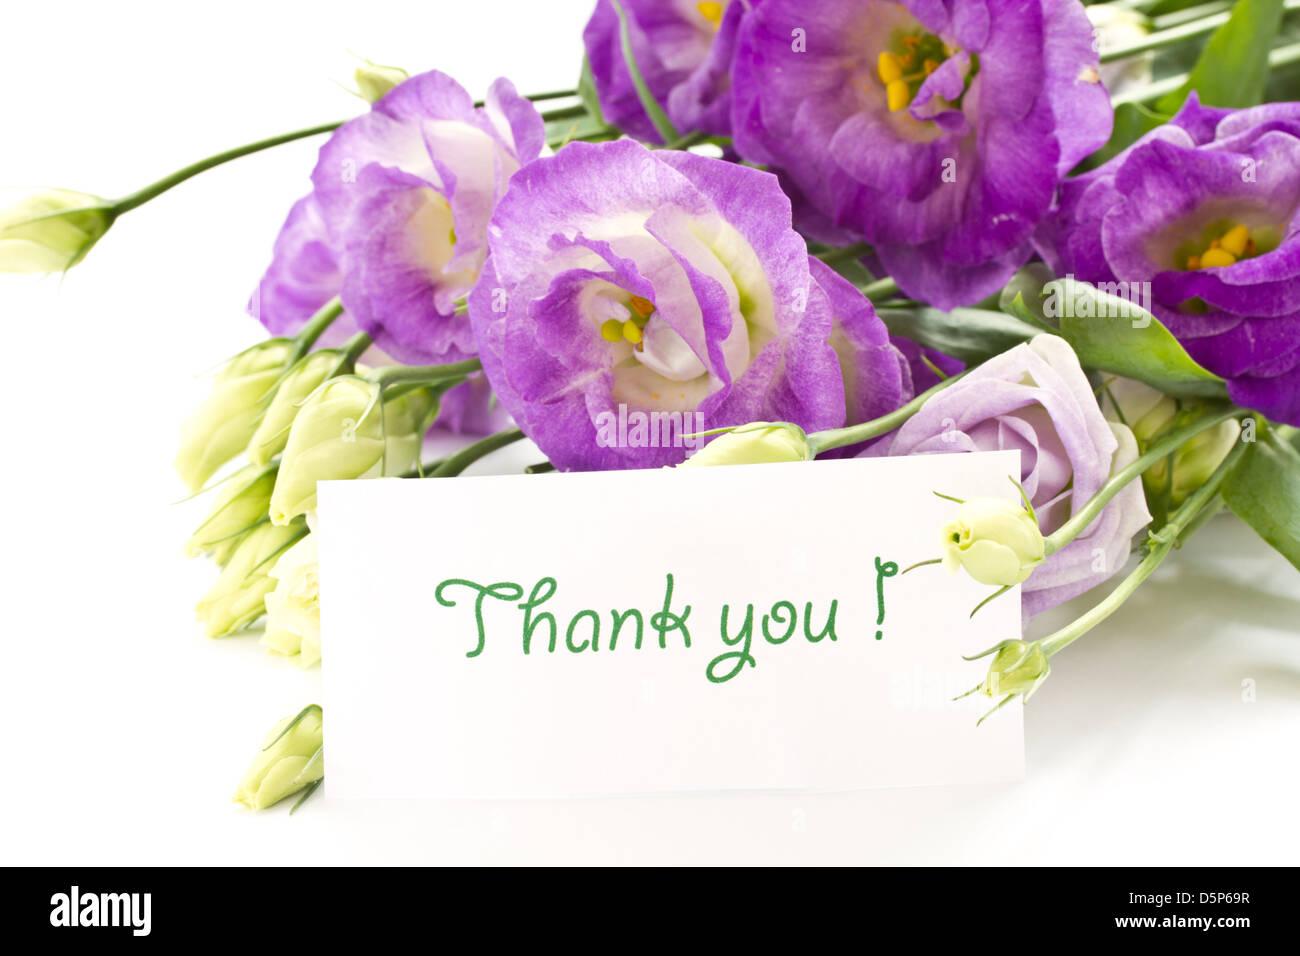 Beautiful bouquet of purple flowers on white lisianthus stock photo beautiful bouquet of purple flowers on white lisianthus izmirmasajfo